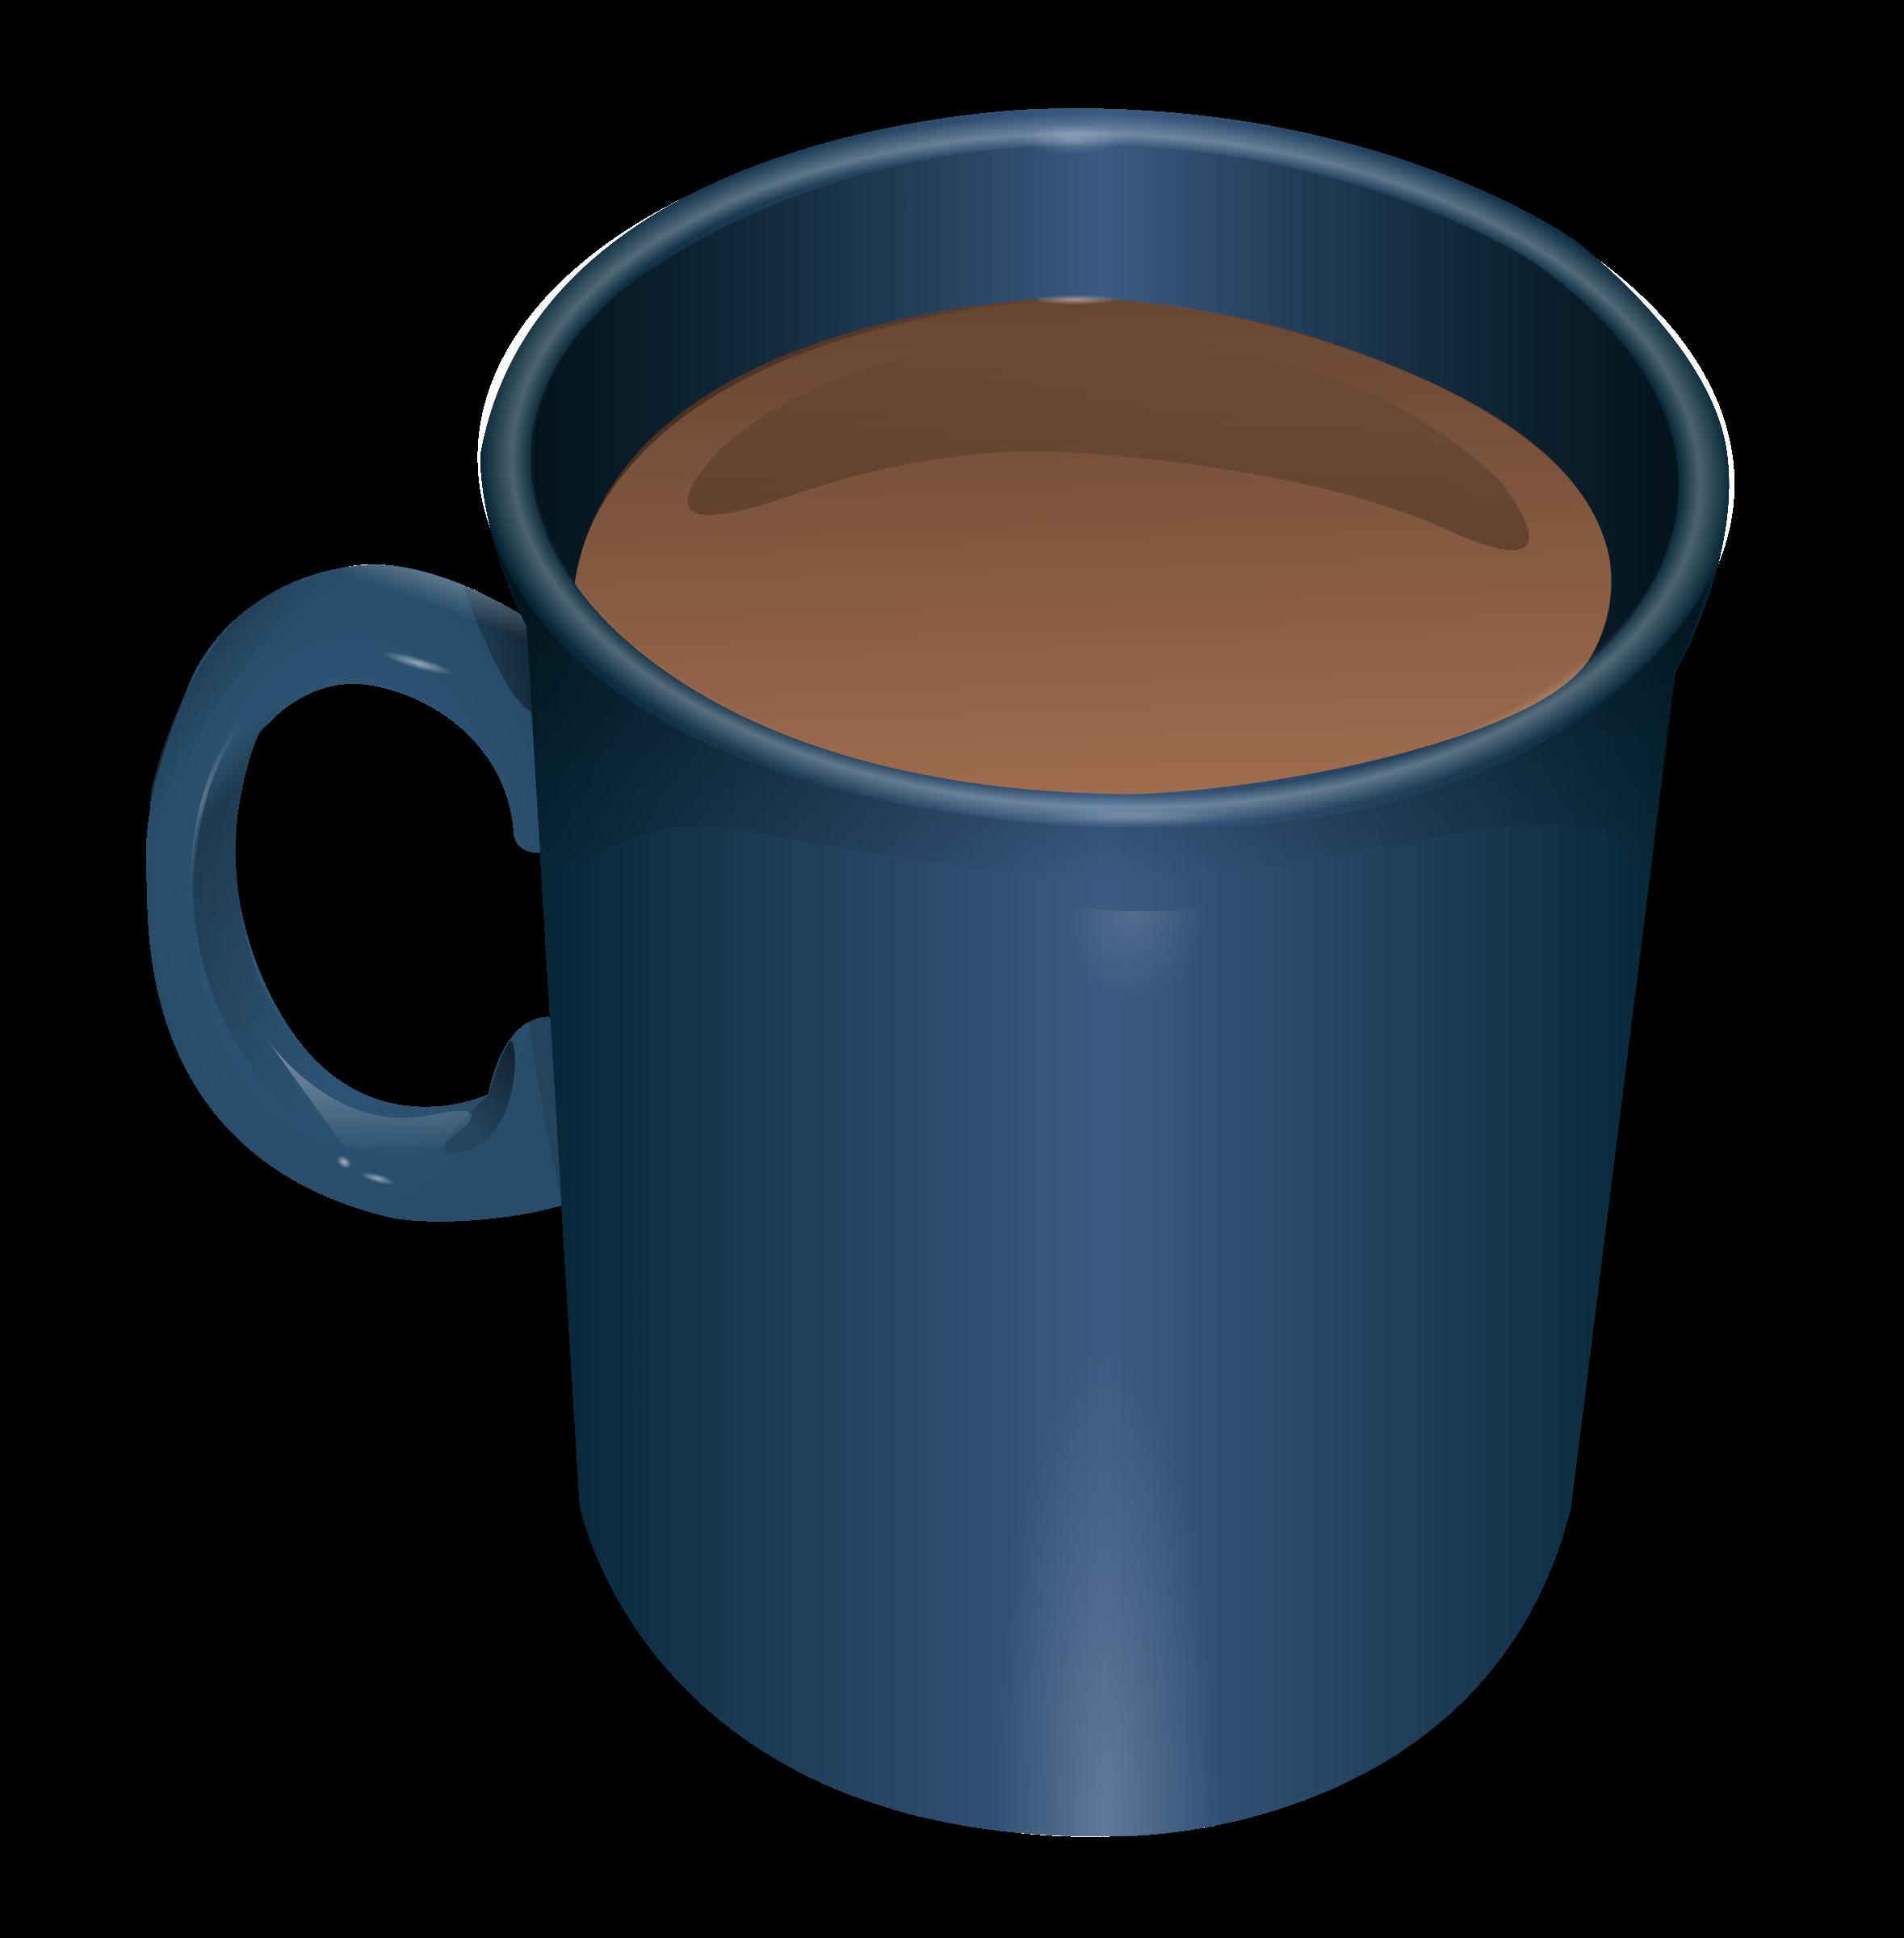 Drink clipart drink coffee, Drink drink coffee Transparent ...